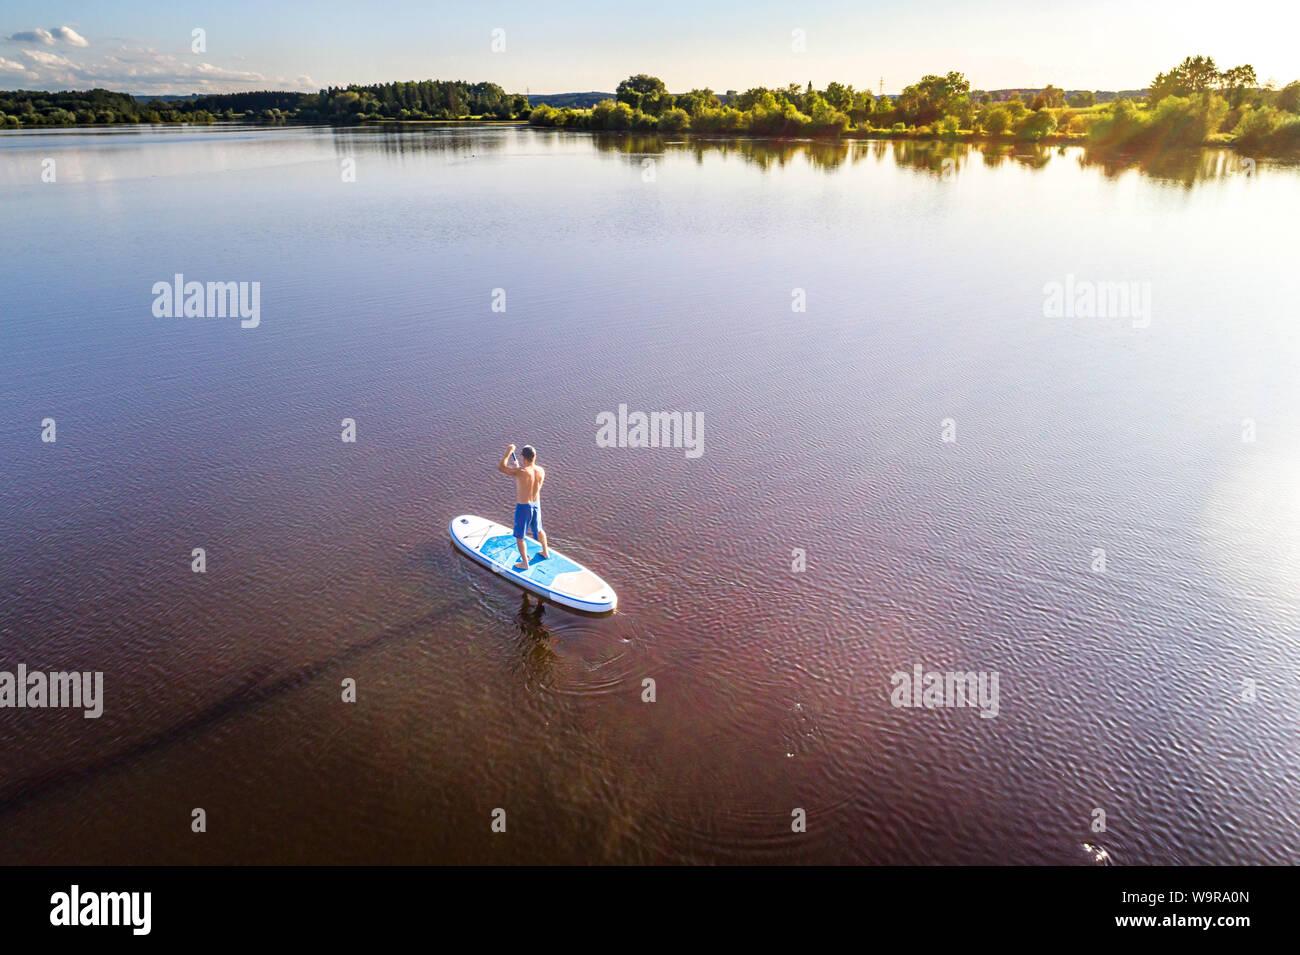 Alemania, Baviera, Allgaeu, standup Frankenhofner paddler en el lago al atardecer Foto de stock